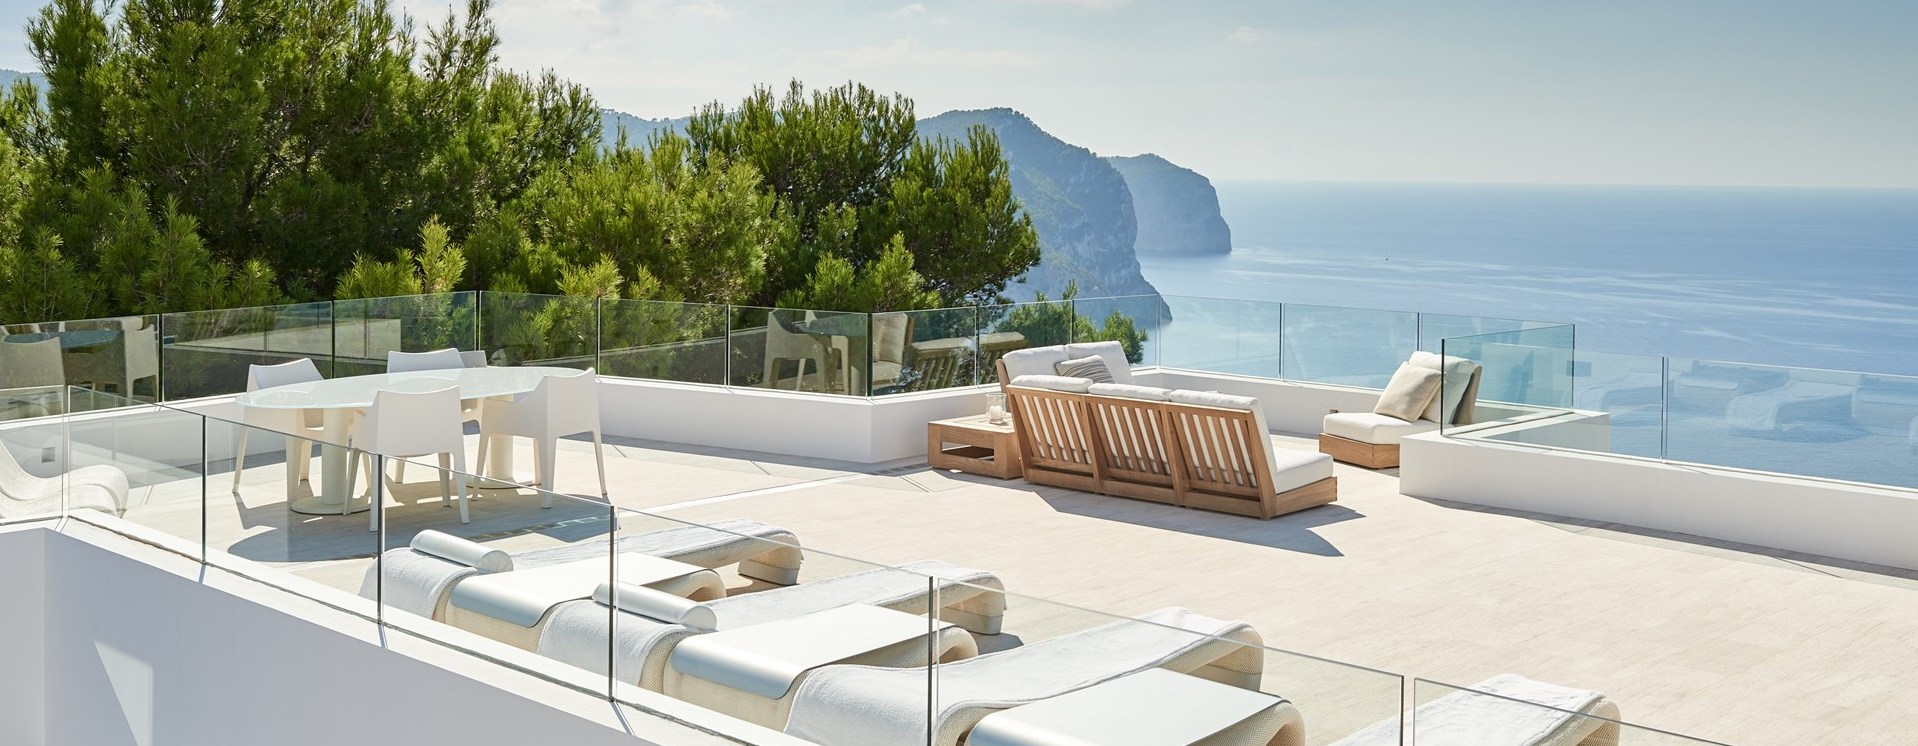 villa-can-castello-roof-terrace